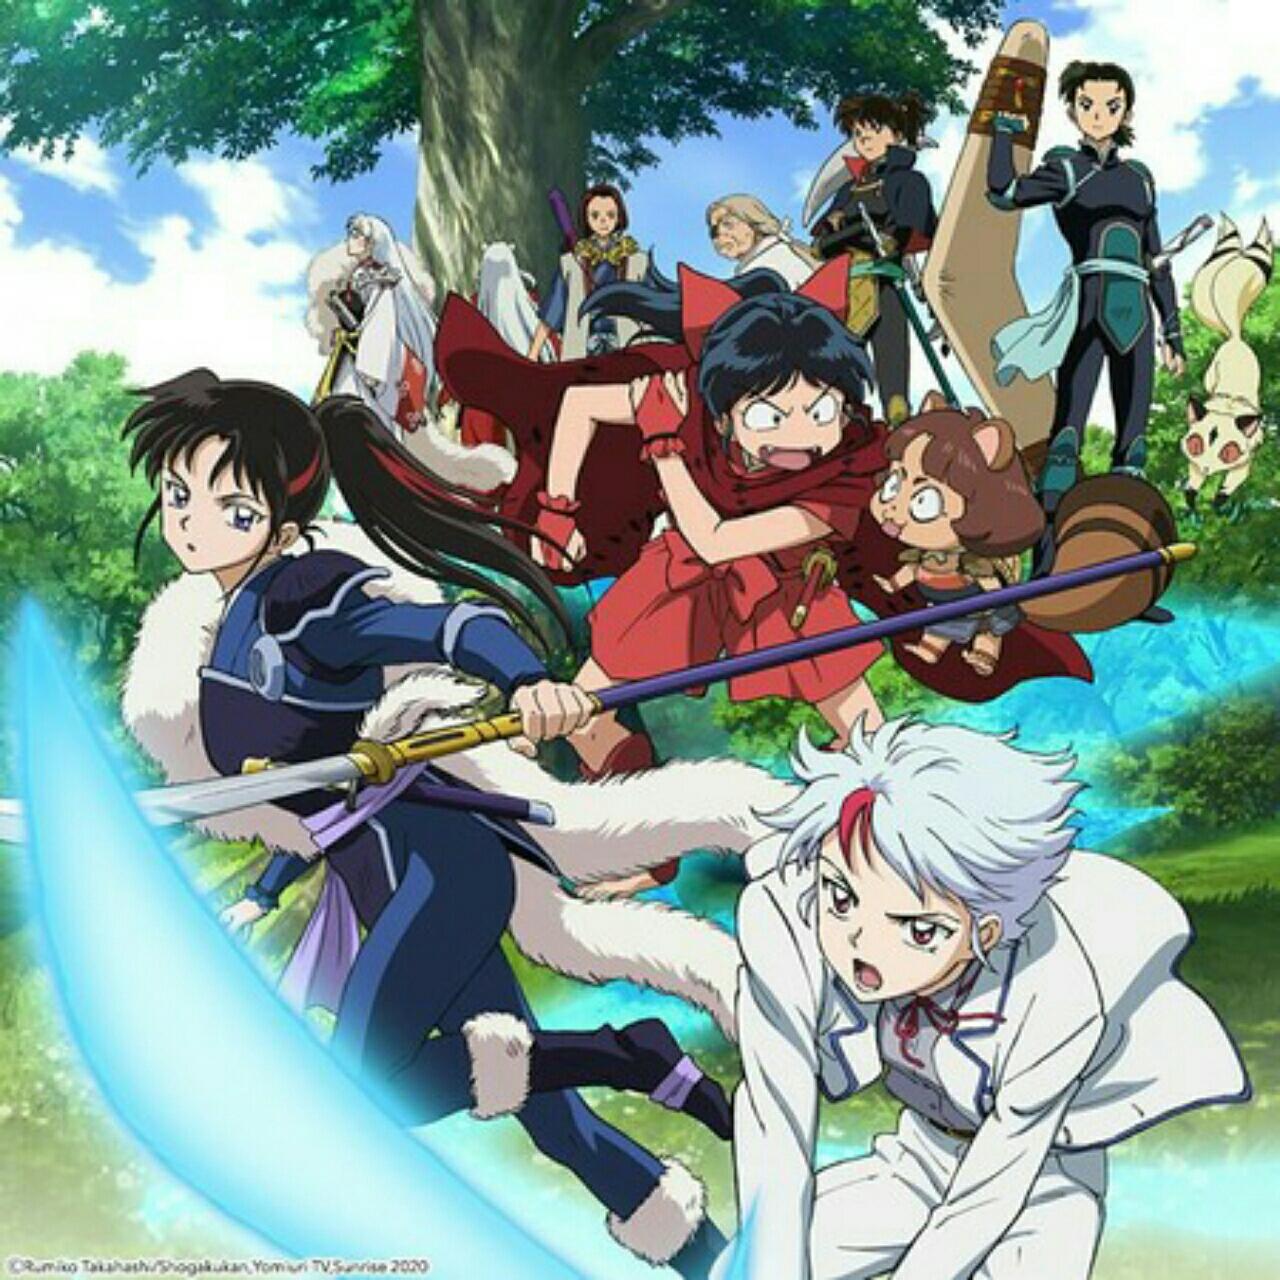 Anime Yashahime Tambahkan 3 Anggota Seiyuu 1